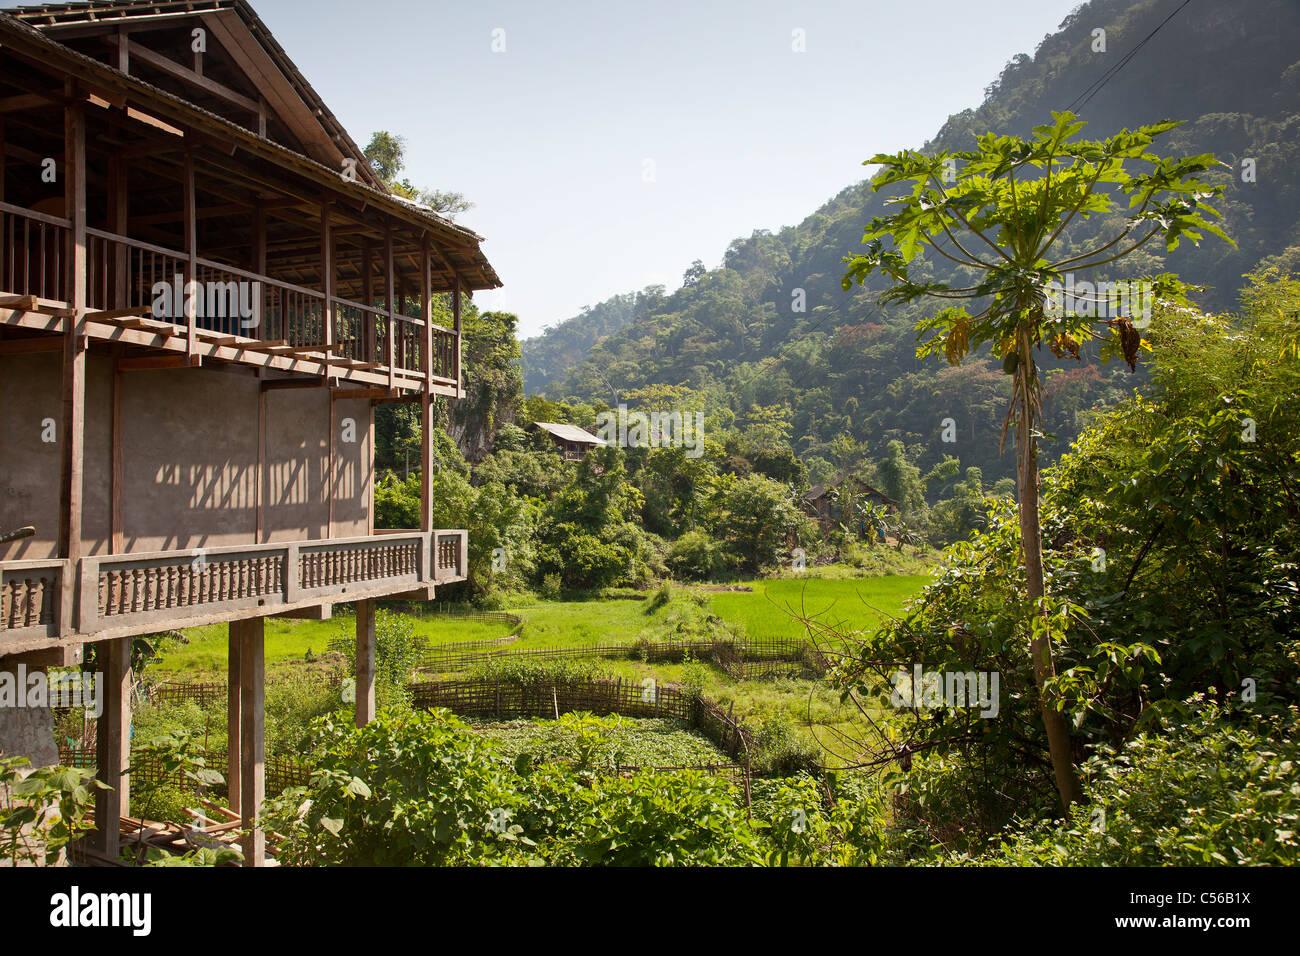 North Vietnam, hardwood farmhouse on arable farmland - Stock Image